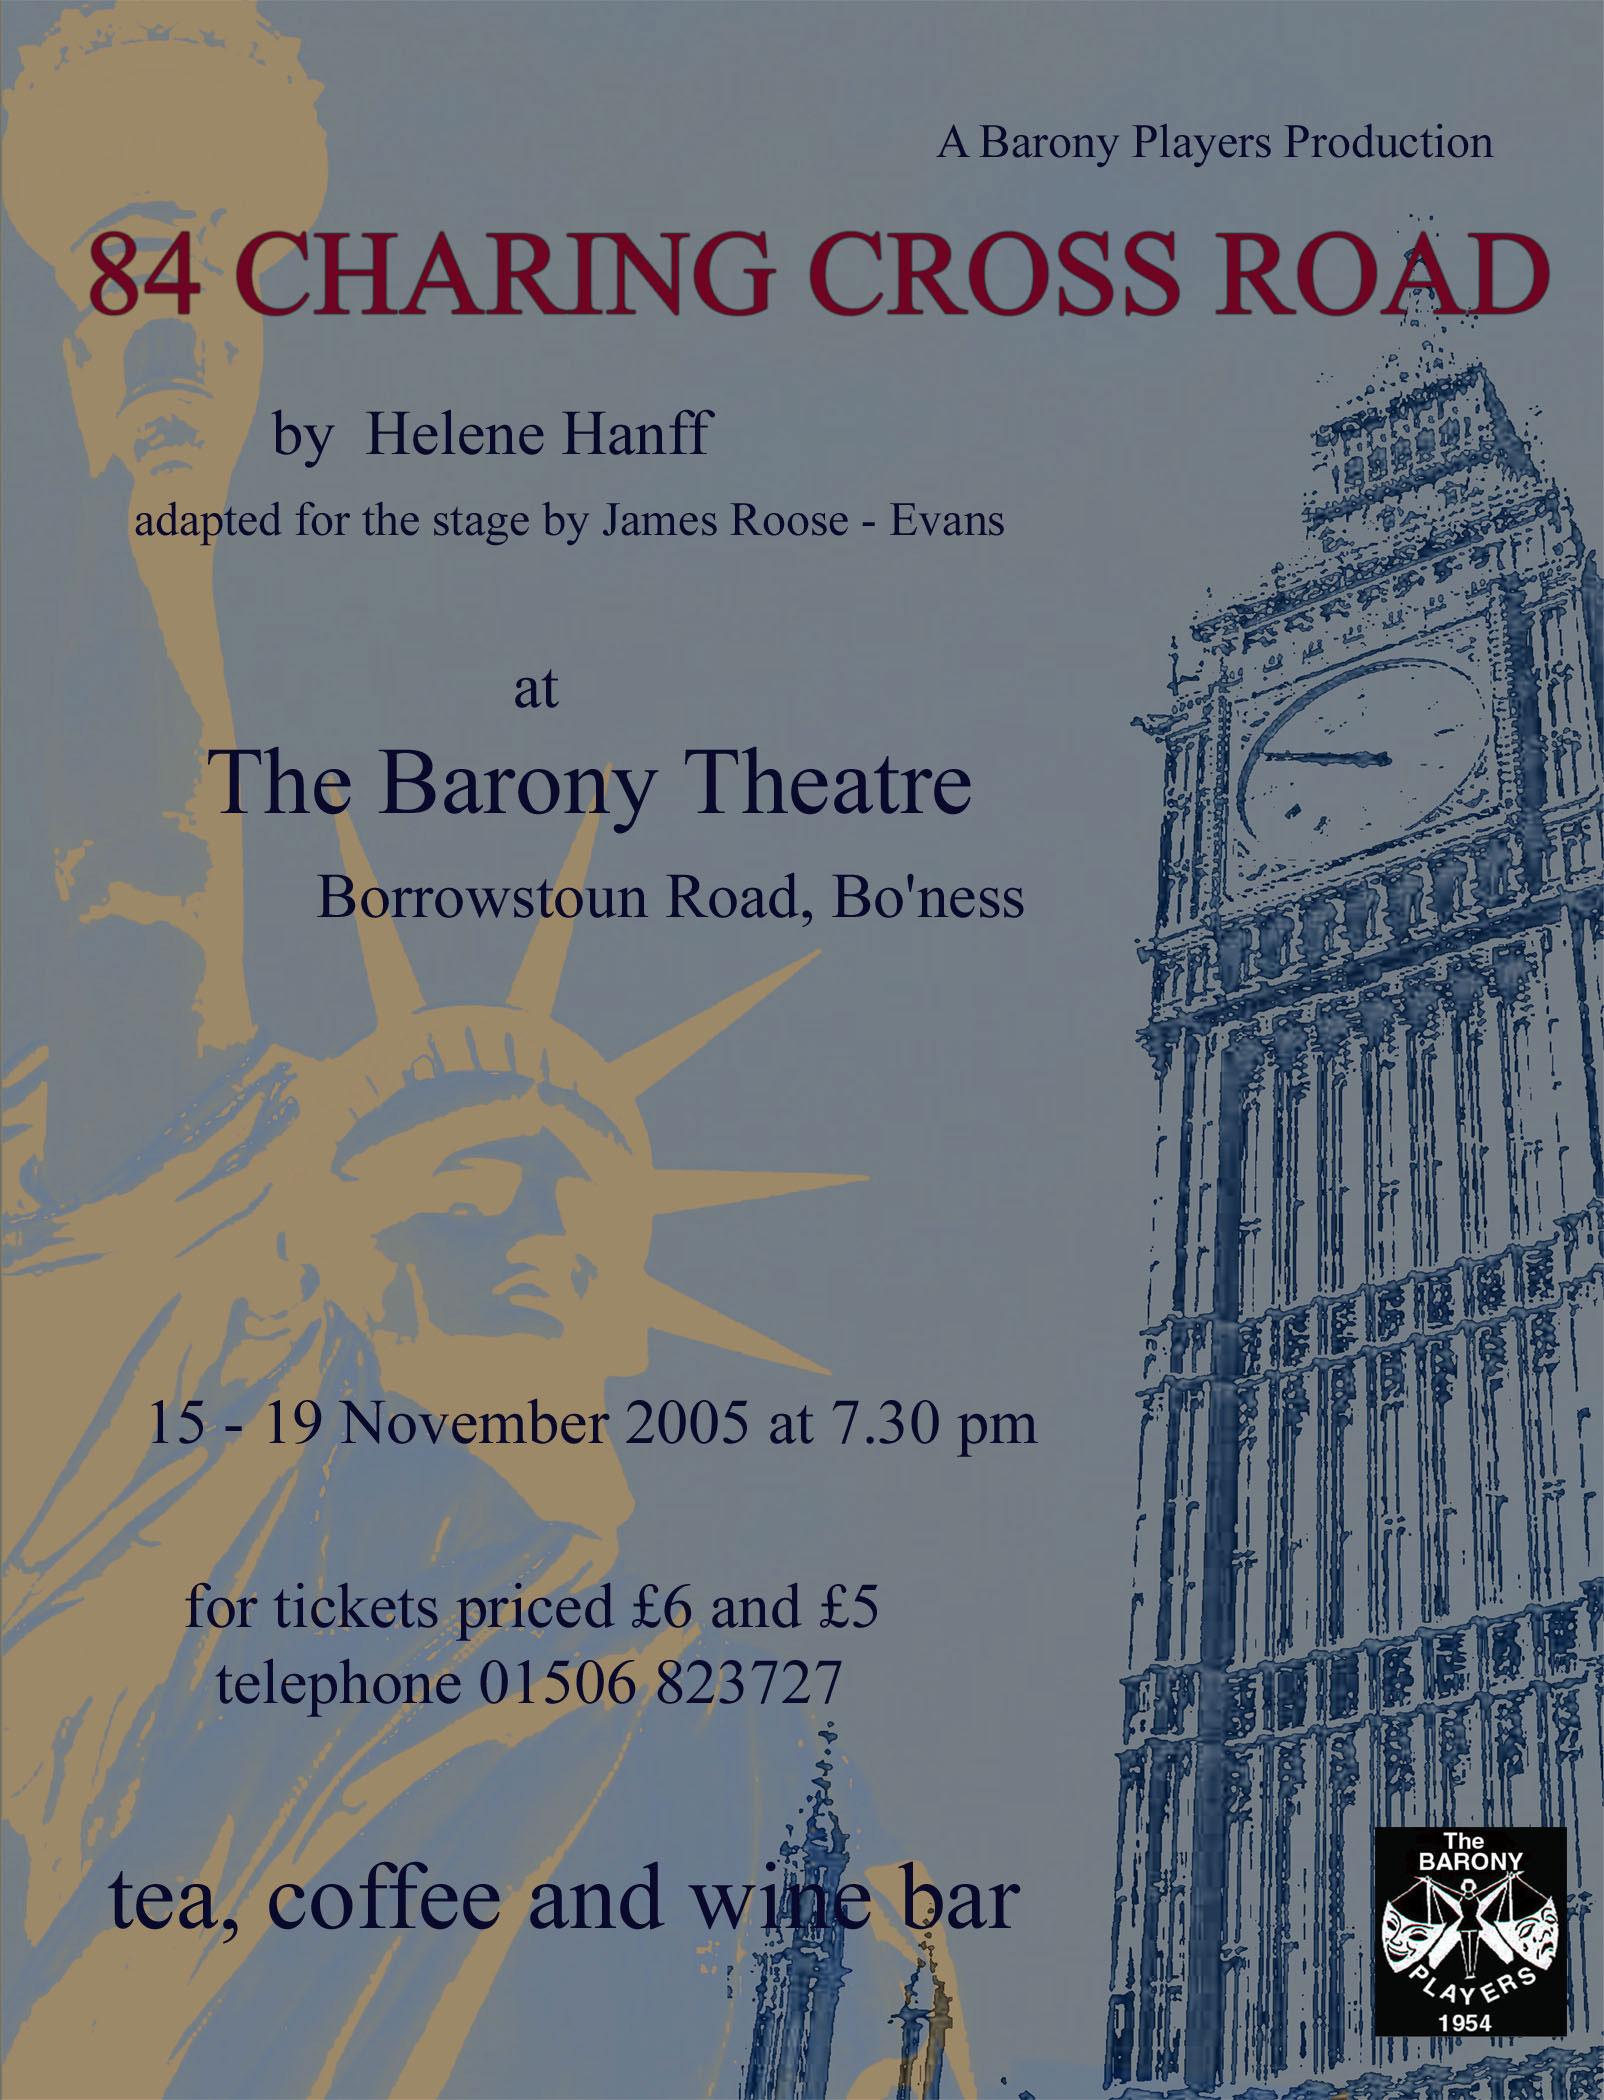 84-charing-cross-road-poste